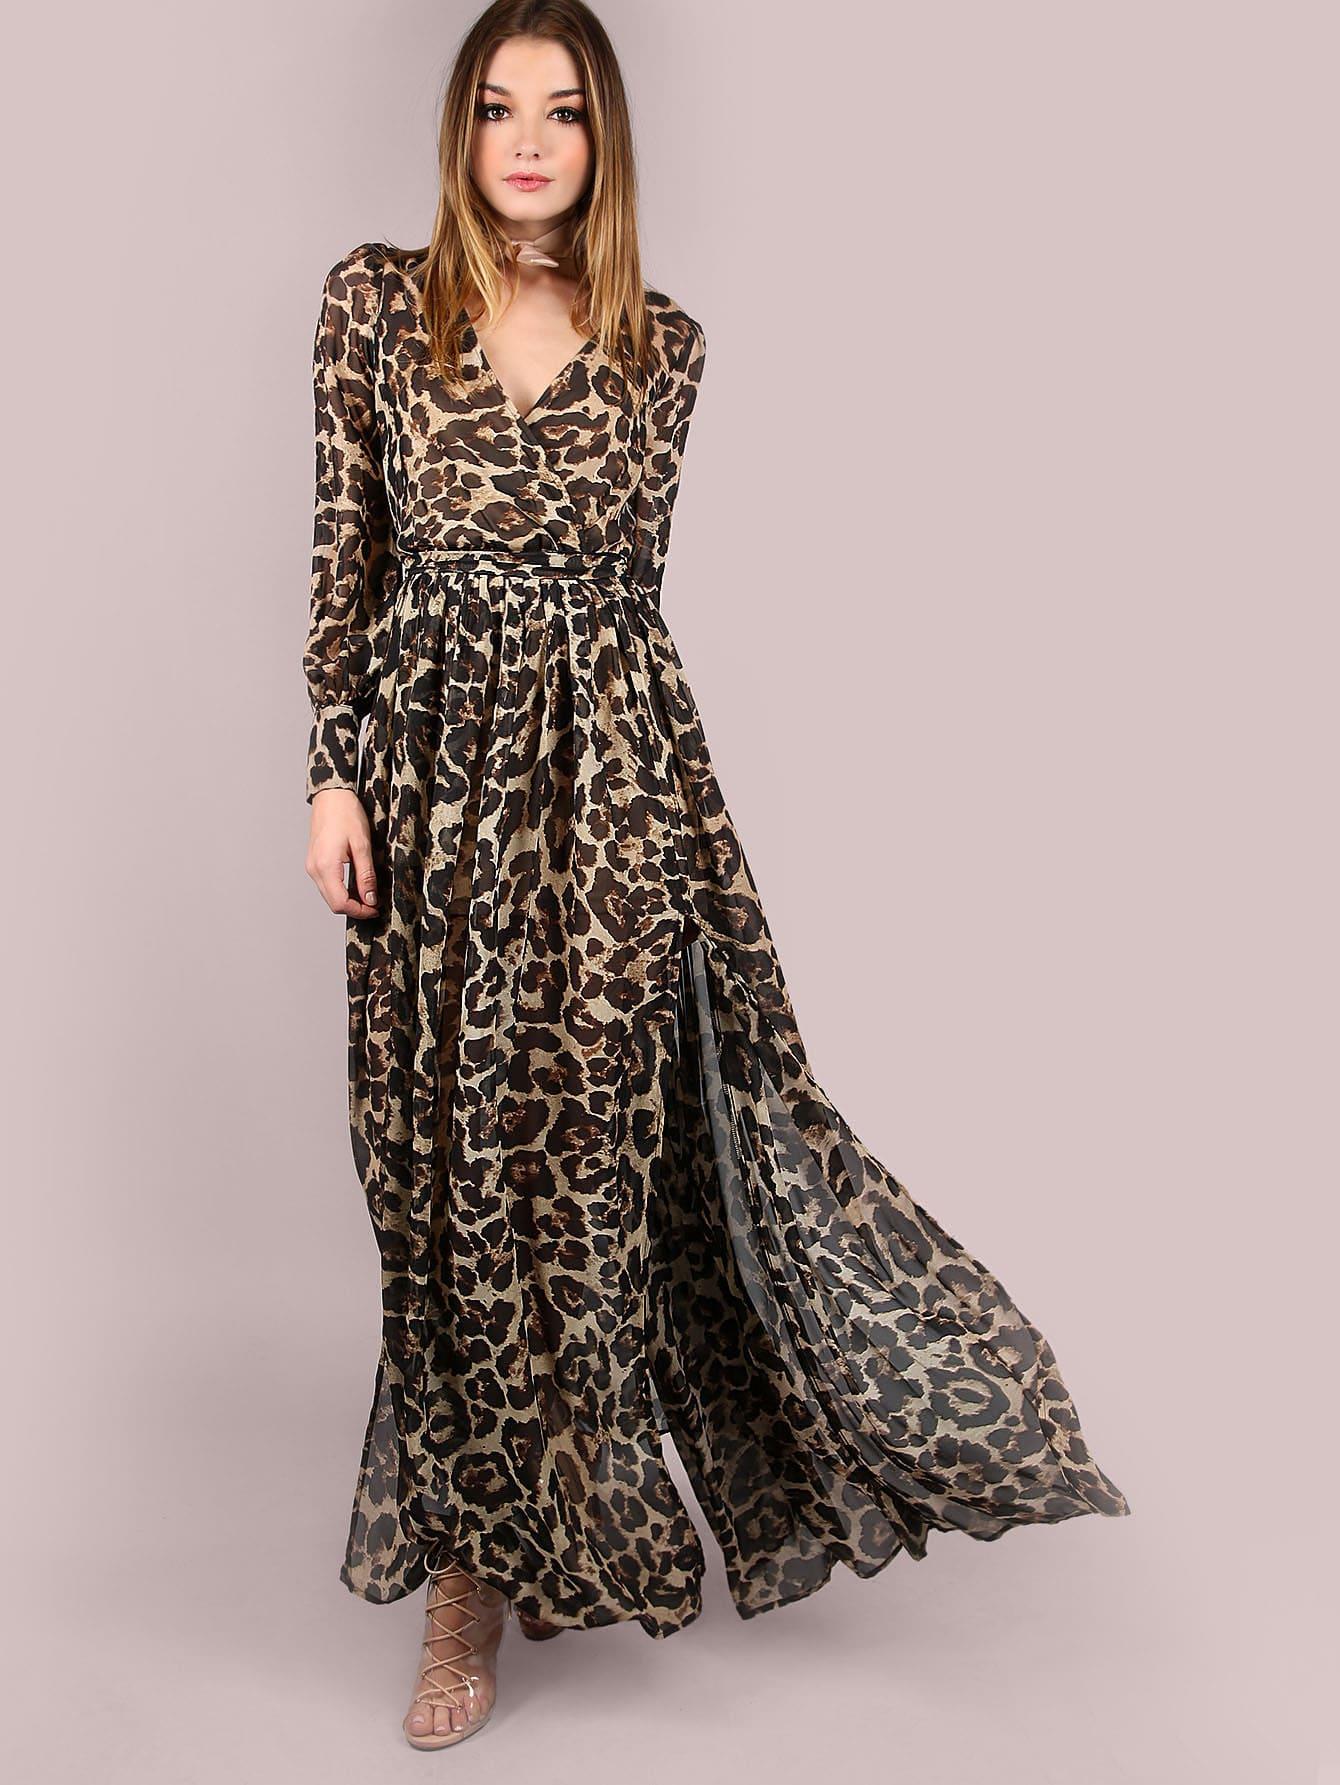 popular stores super quality beauty Leopard Print Wrap Chiffon Maxi Dress LEOPARD EmmaCloth-Women Fast ...